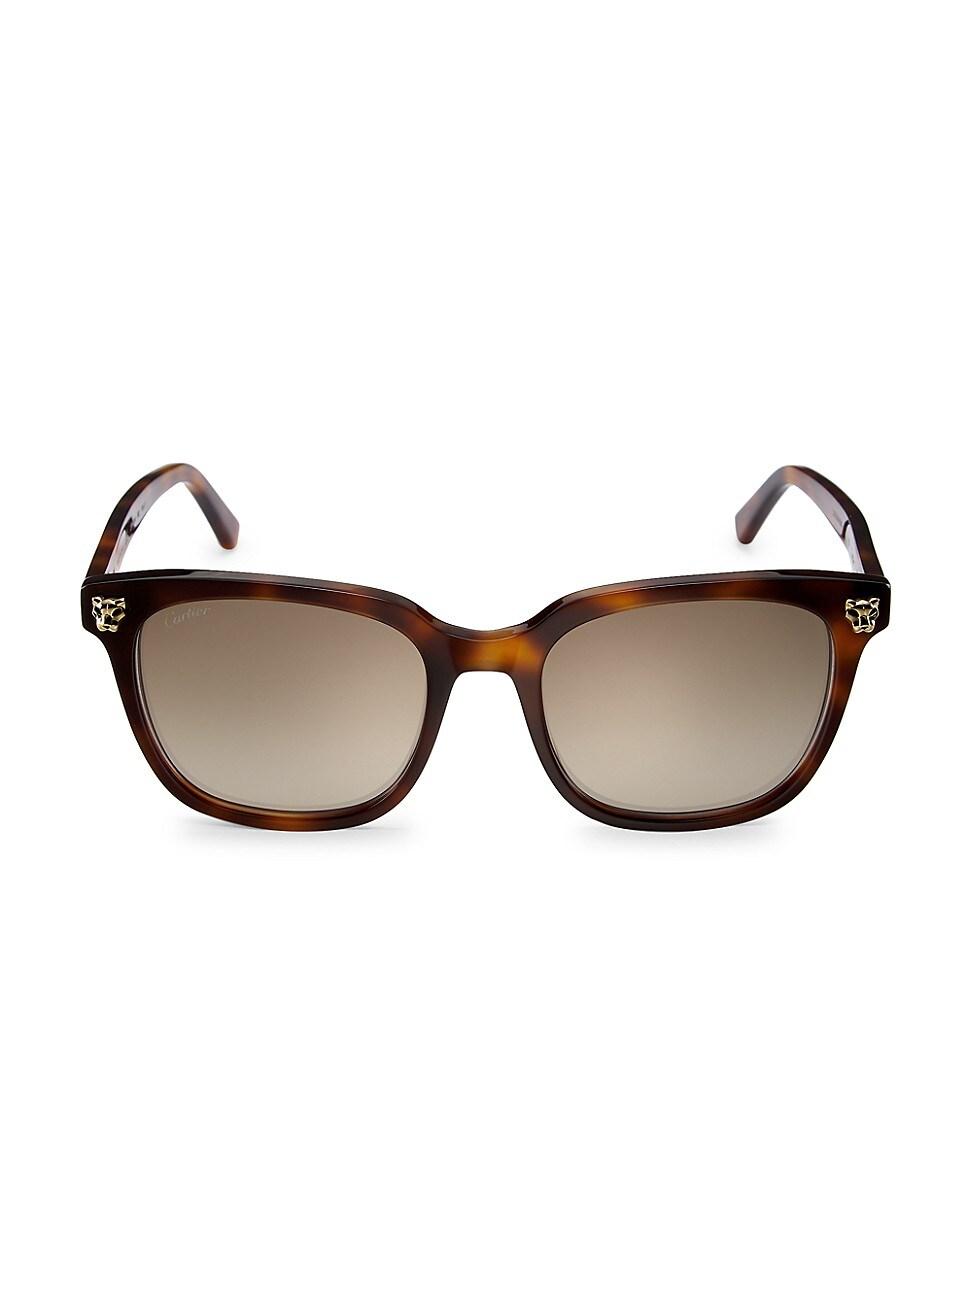 Cartier Women's 51mm Cat Eye Sunglasses In Brown